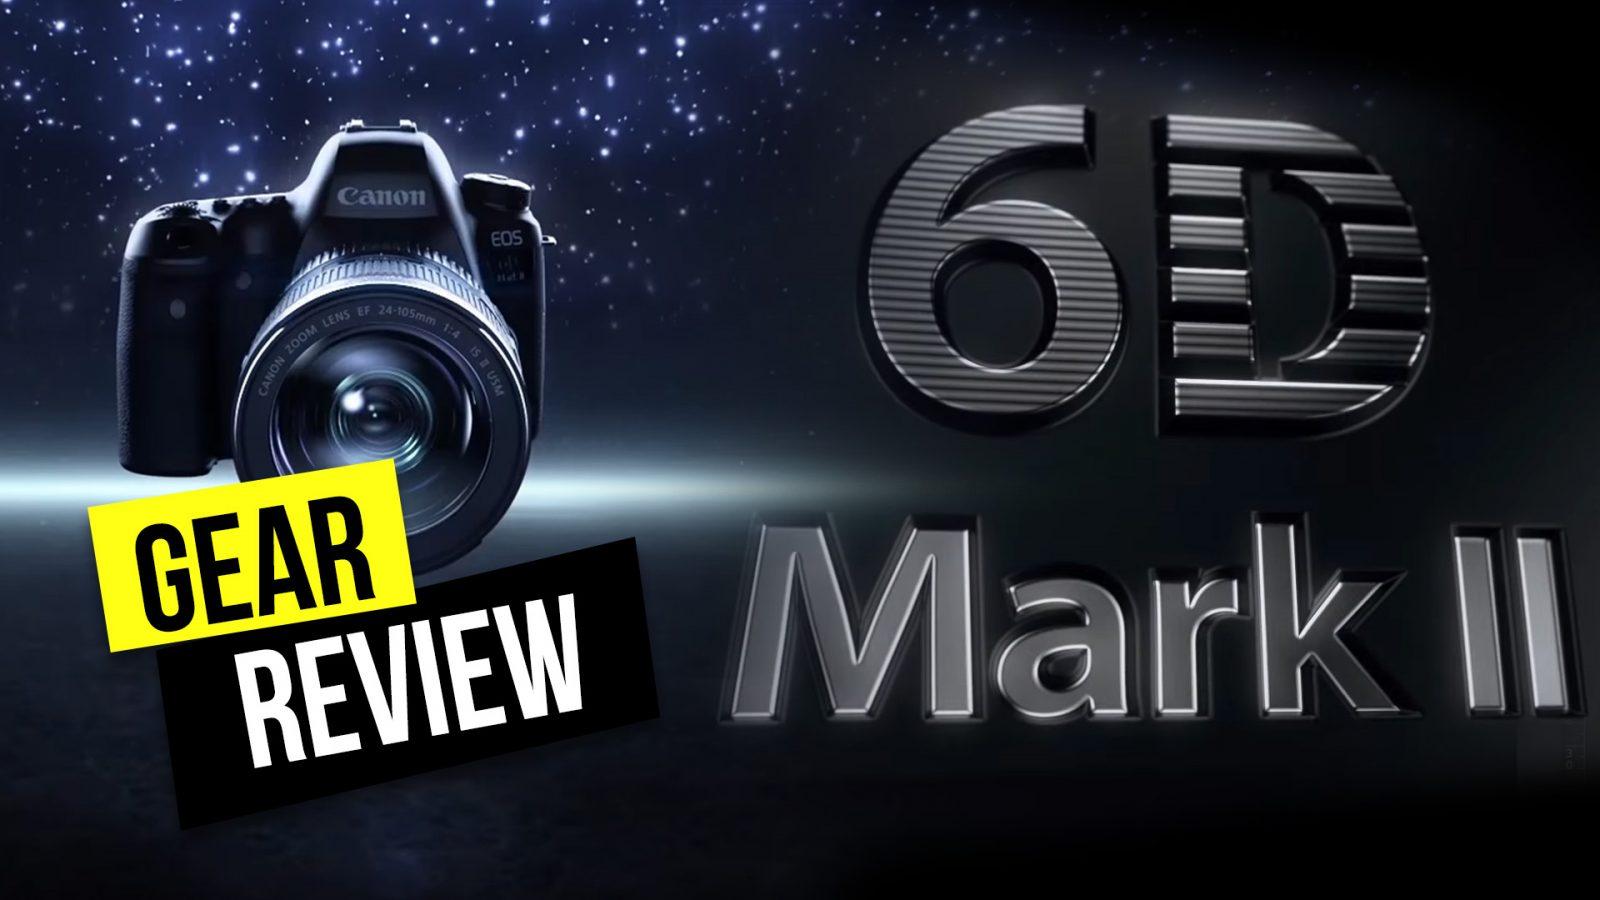 Gear Review - Canon EOS 6D Mark II | 50mm Vietnam